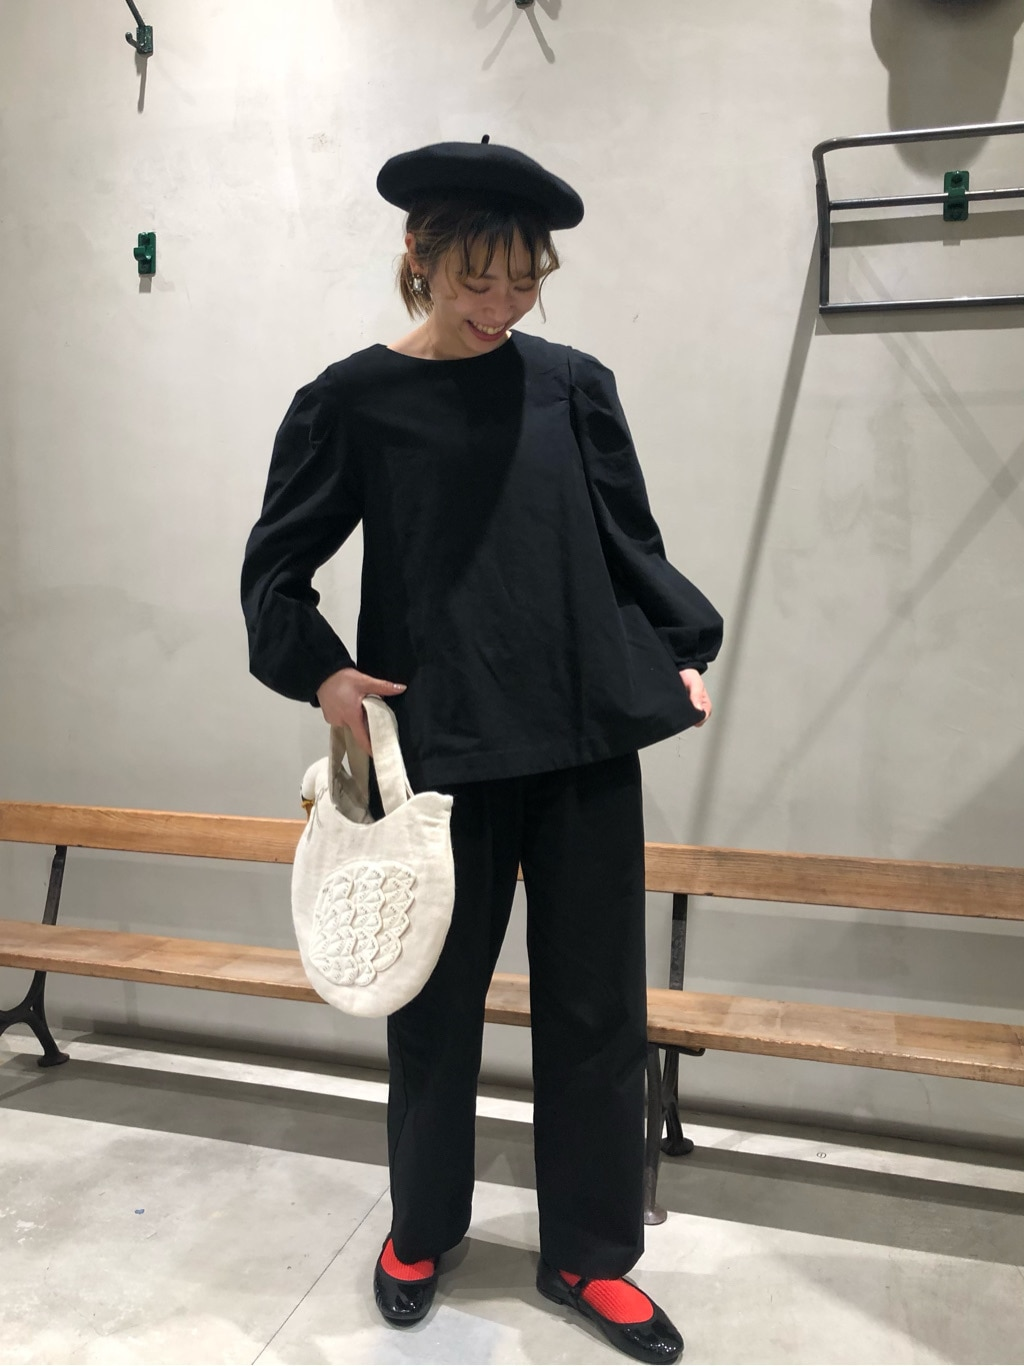 yuni 東急プラザ銀座 身長:154cm 2020.10.19